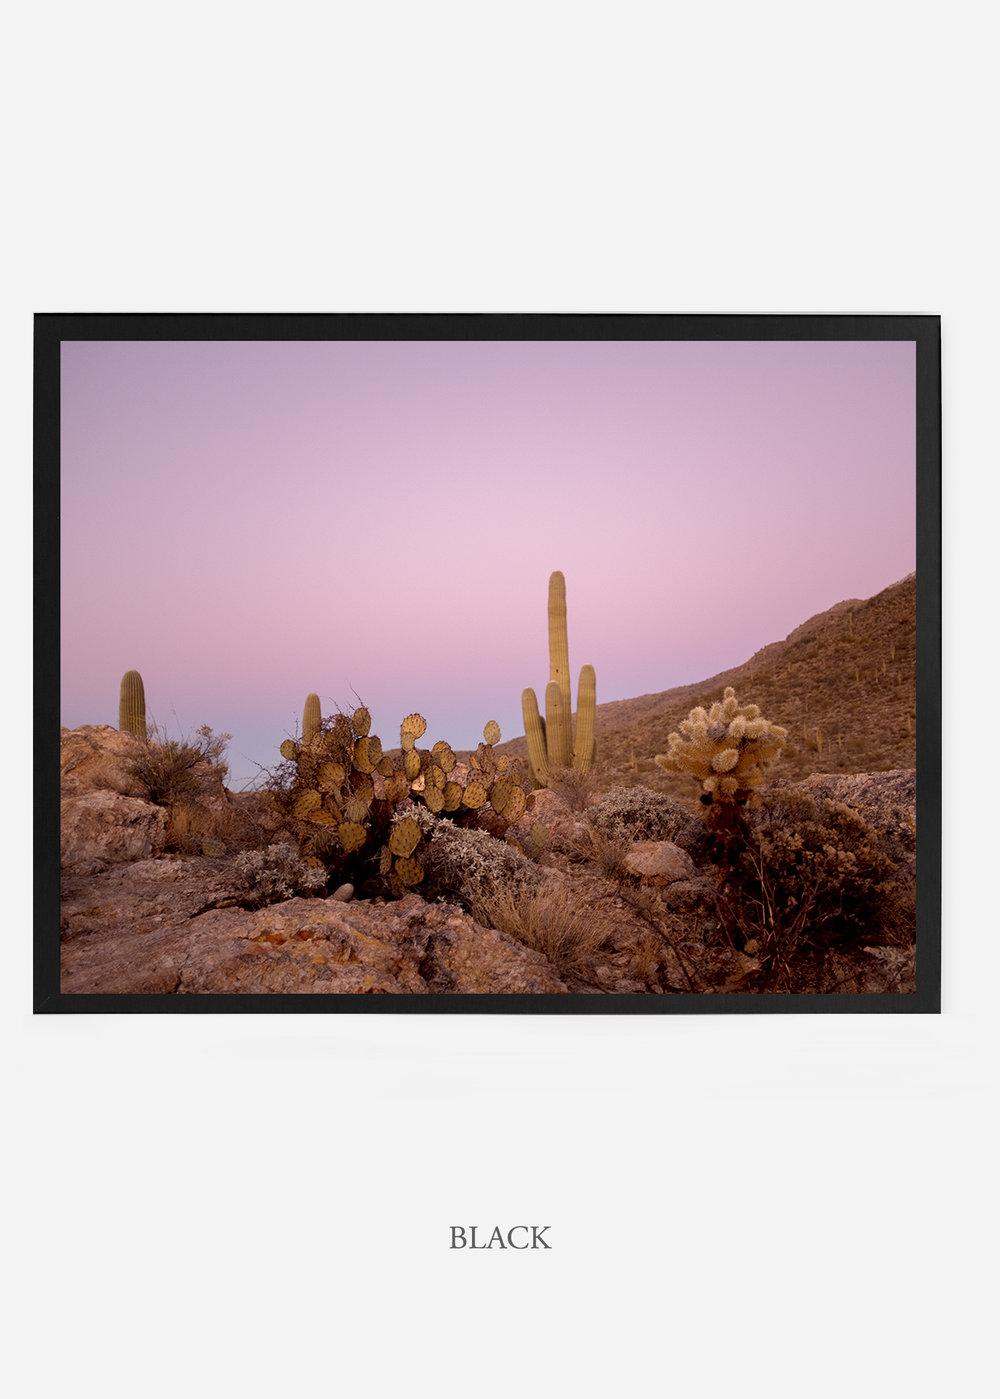 nomat_blackframe-saguaroNo.9-wildercalifornia-art-wallart-cactusprint-homedecor-prints-arizona-botanical-artwork-interiordesign.jpg